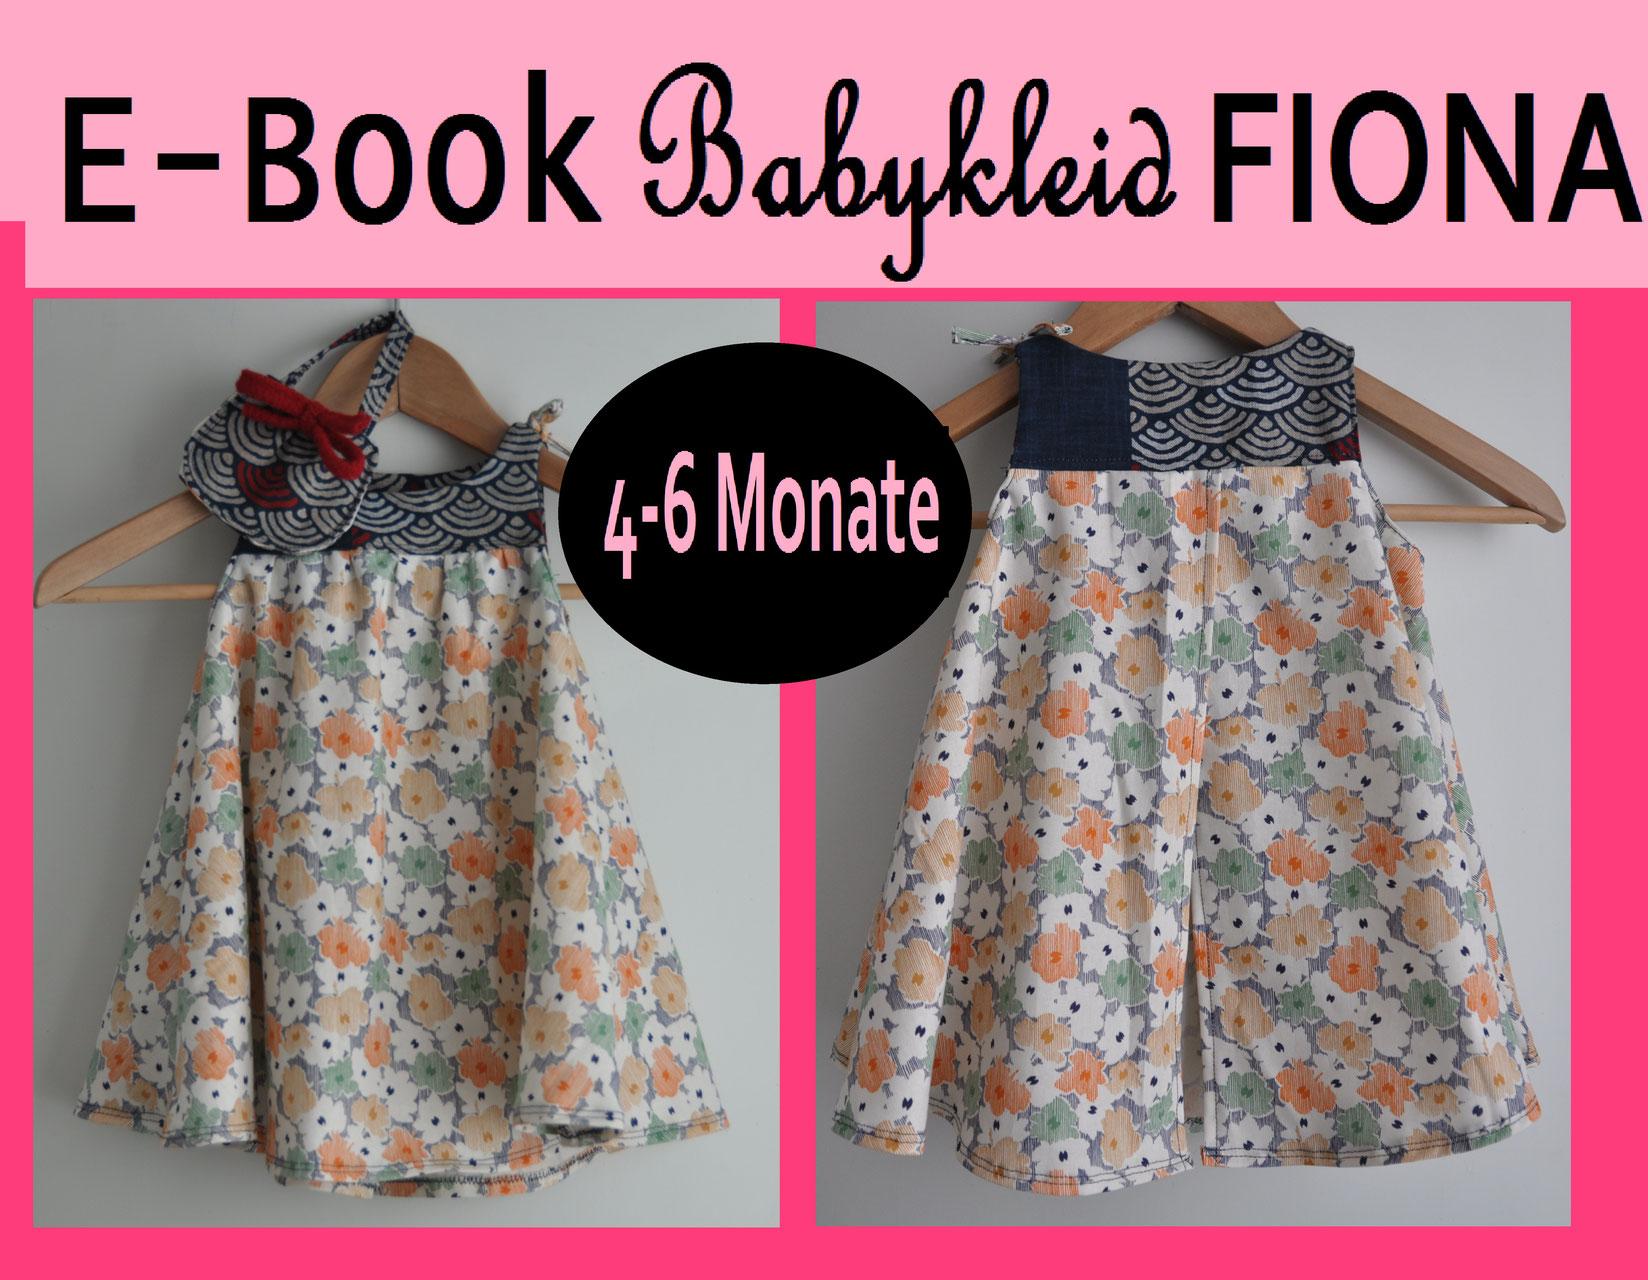 E-Book/ Schnittmuster Babykleid FIONA 4-6 Monate - Schnittmuster von ...